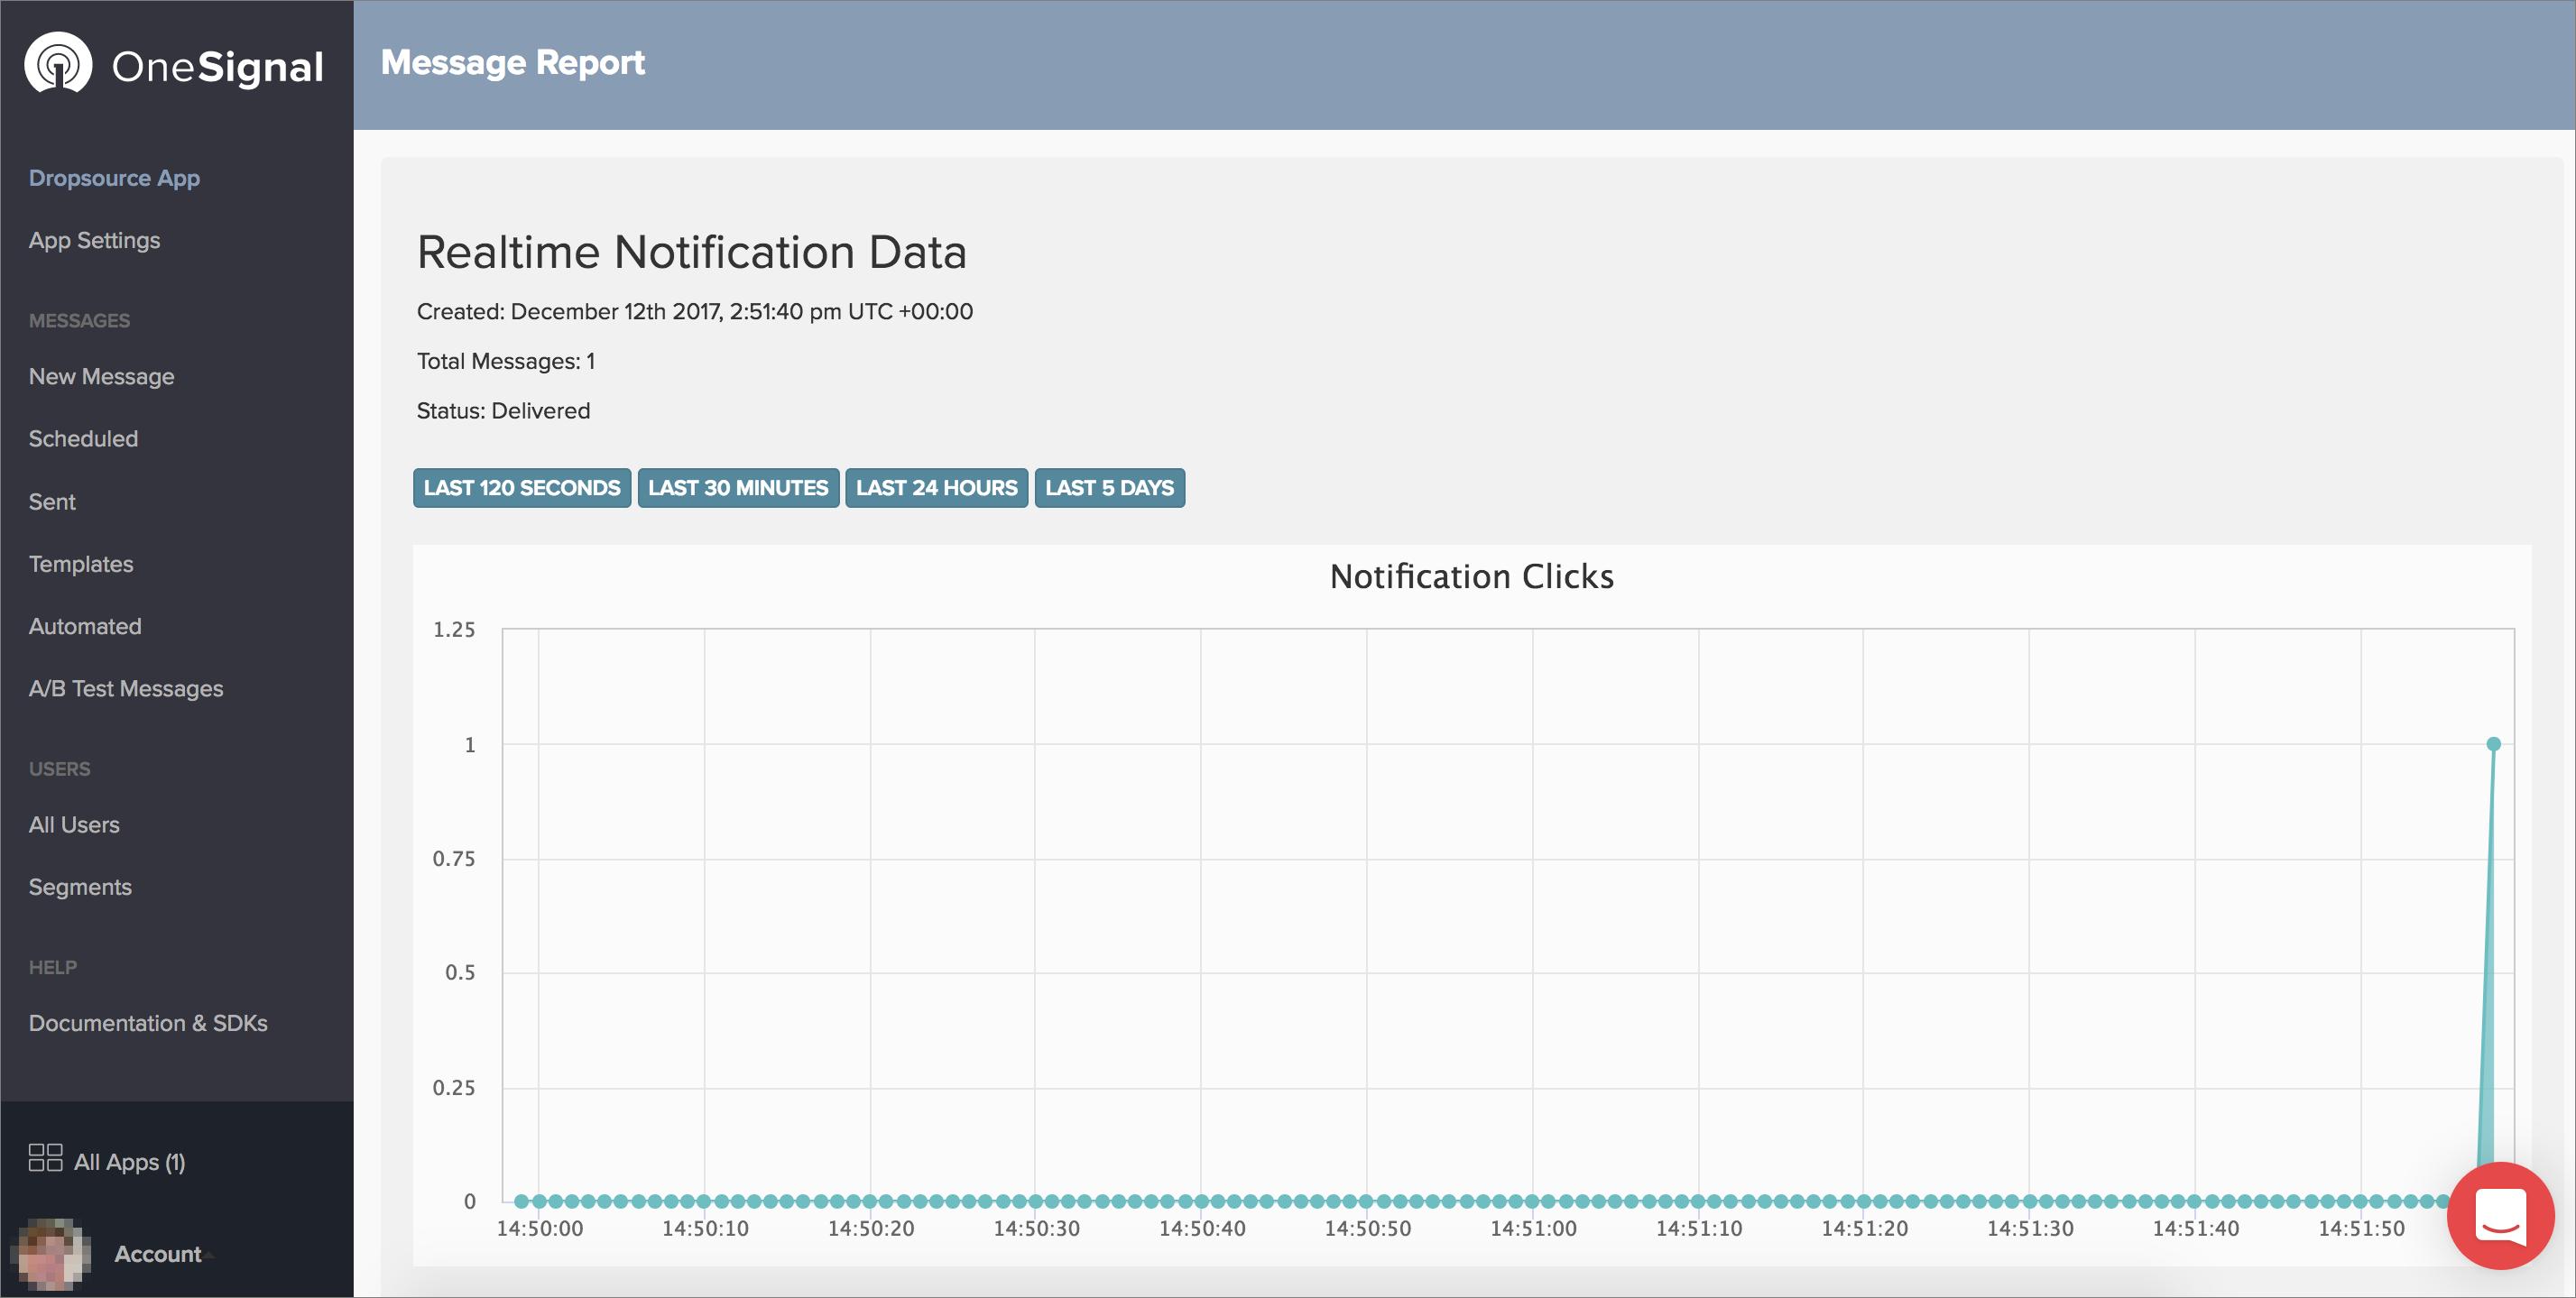 onesignal notification clicks